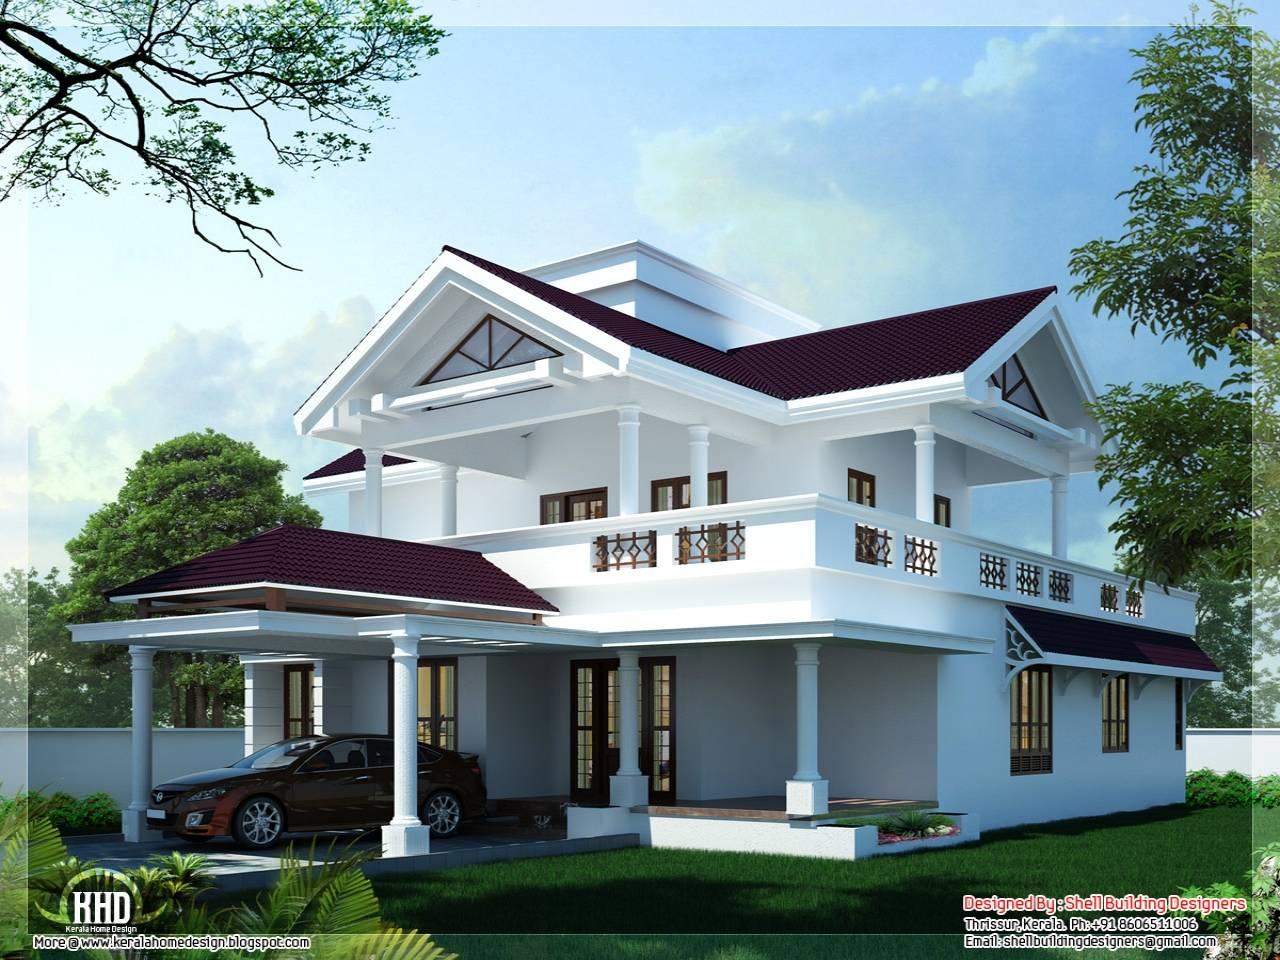 Bungalow Roof Design Top Modern Designs Styles Single Home Plans Blueprints 155701